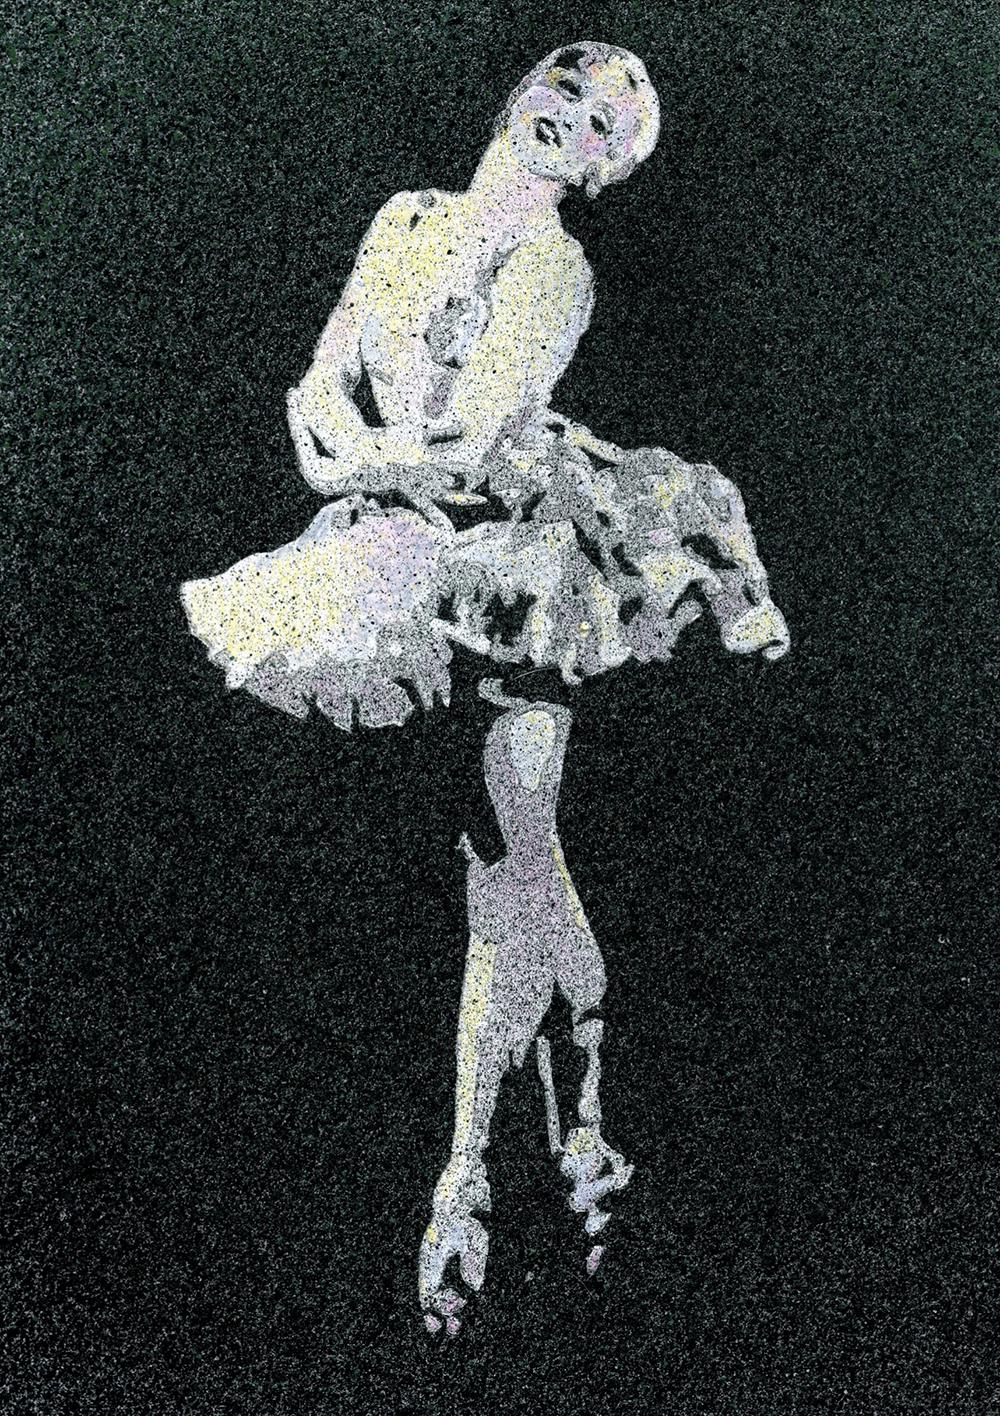 Prima Ballerina (Danilova)